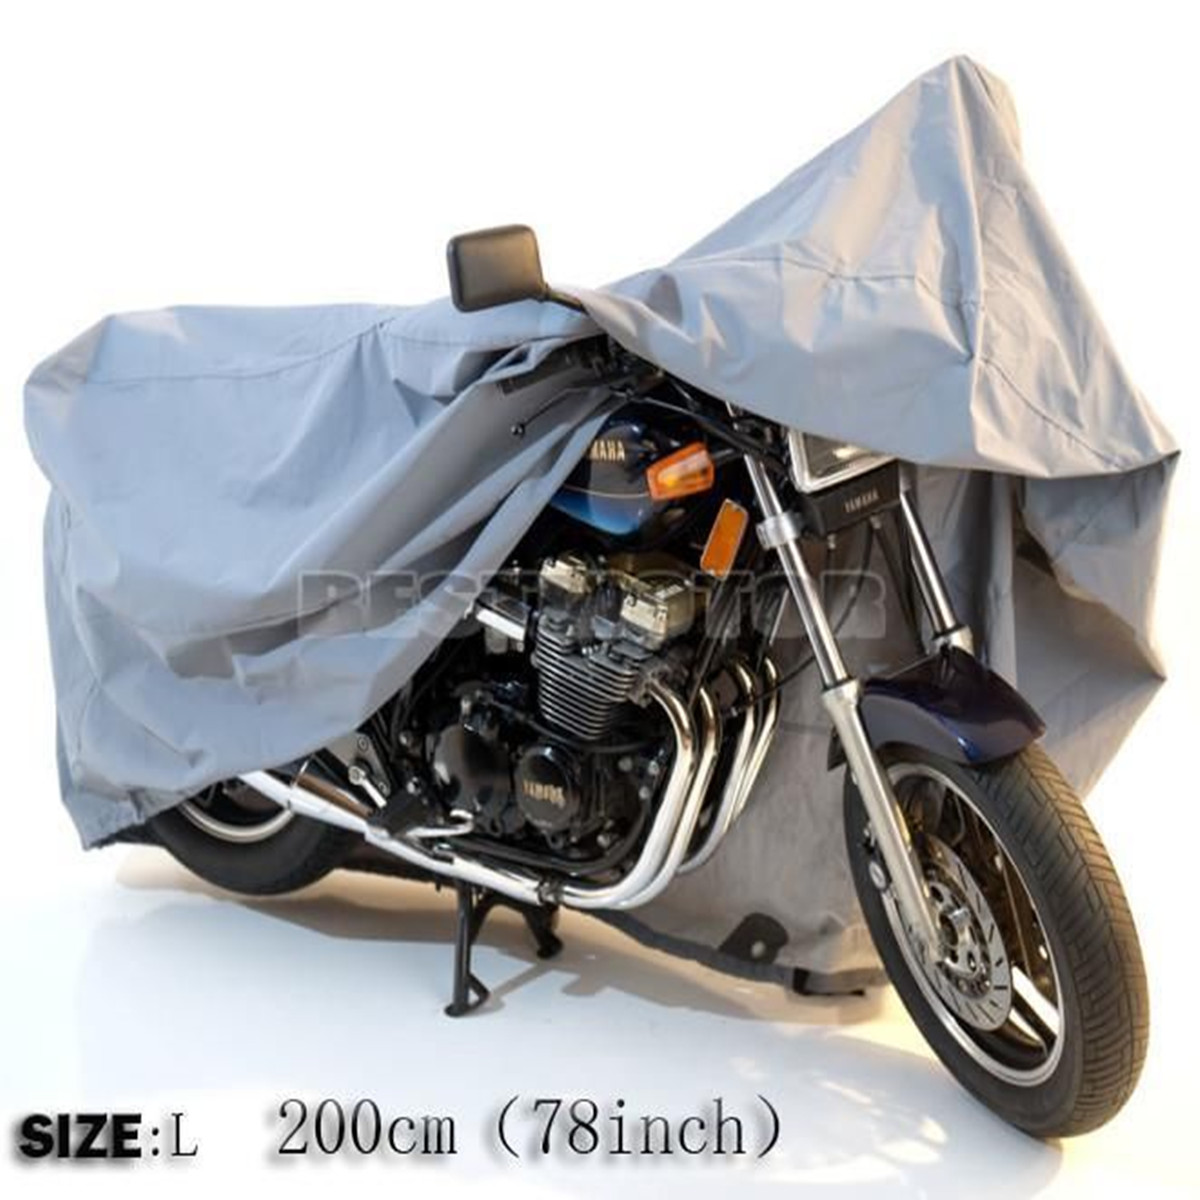 L Motorcycle Waterproof Outdoor Motor Bike Scooter Rain